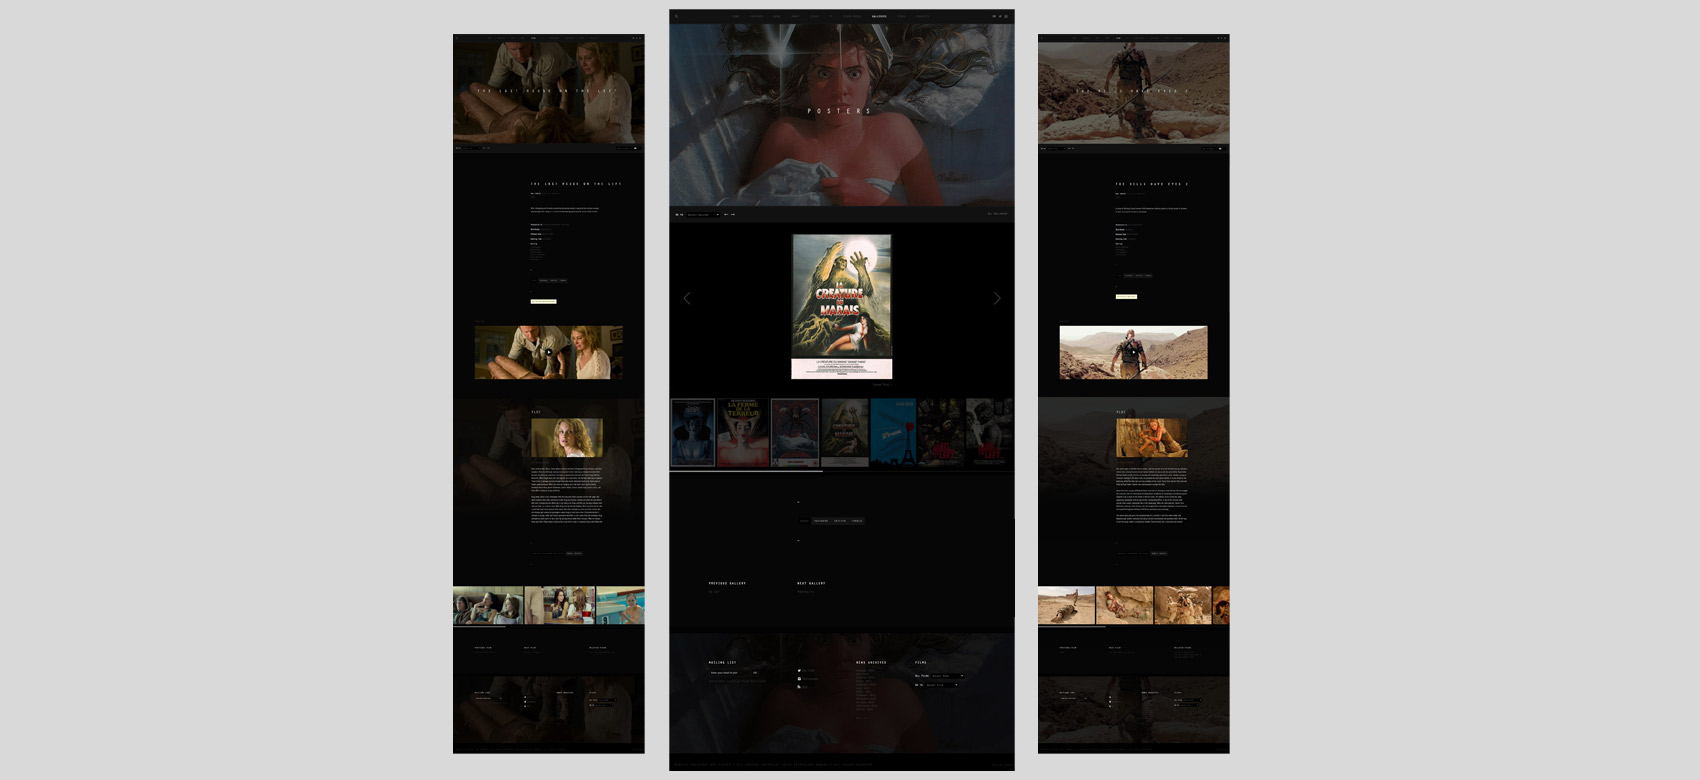 Celis digital design development new york ux ui for Design consultancy new york